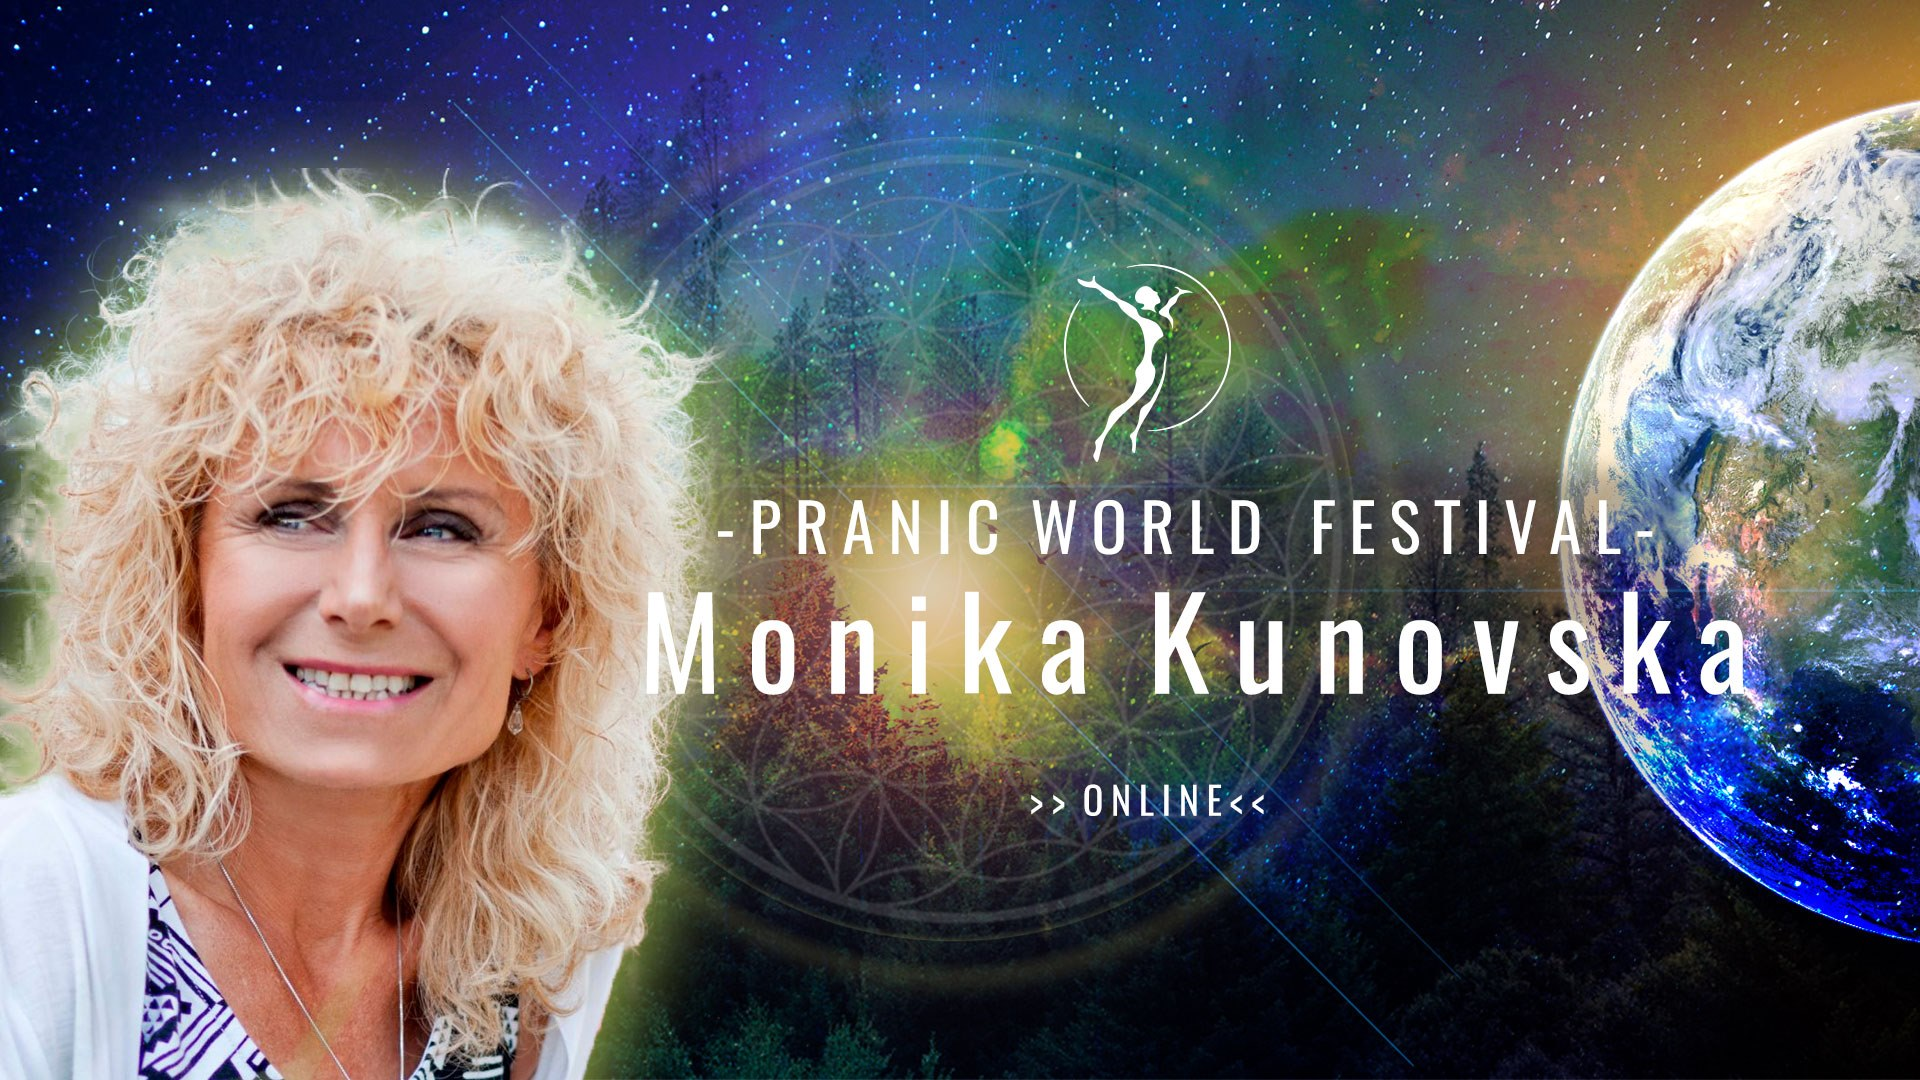 Monika Kunovska